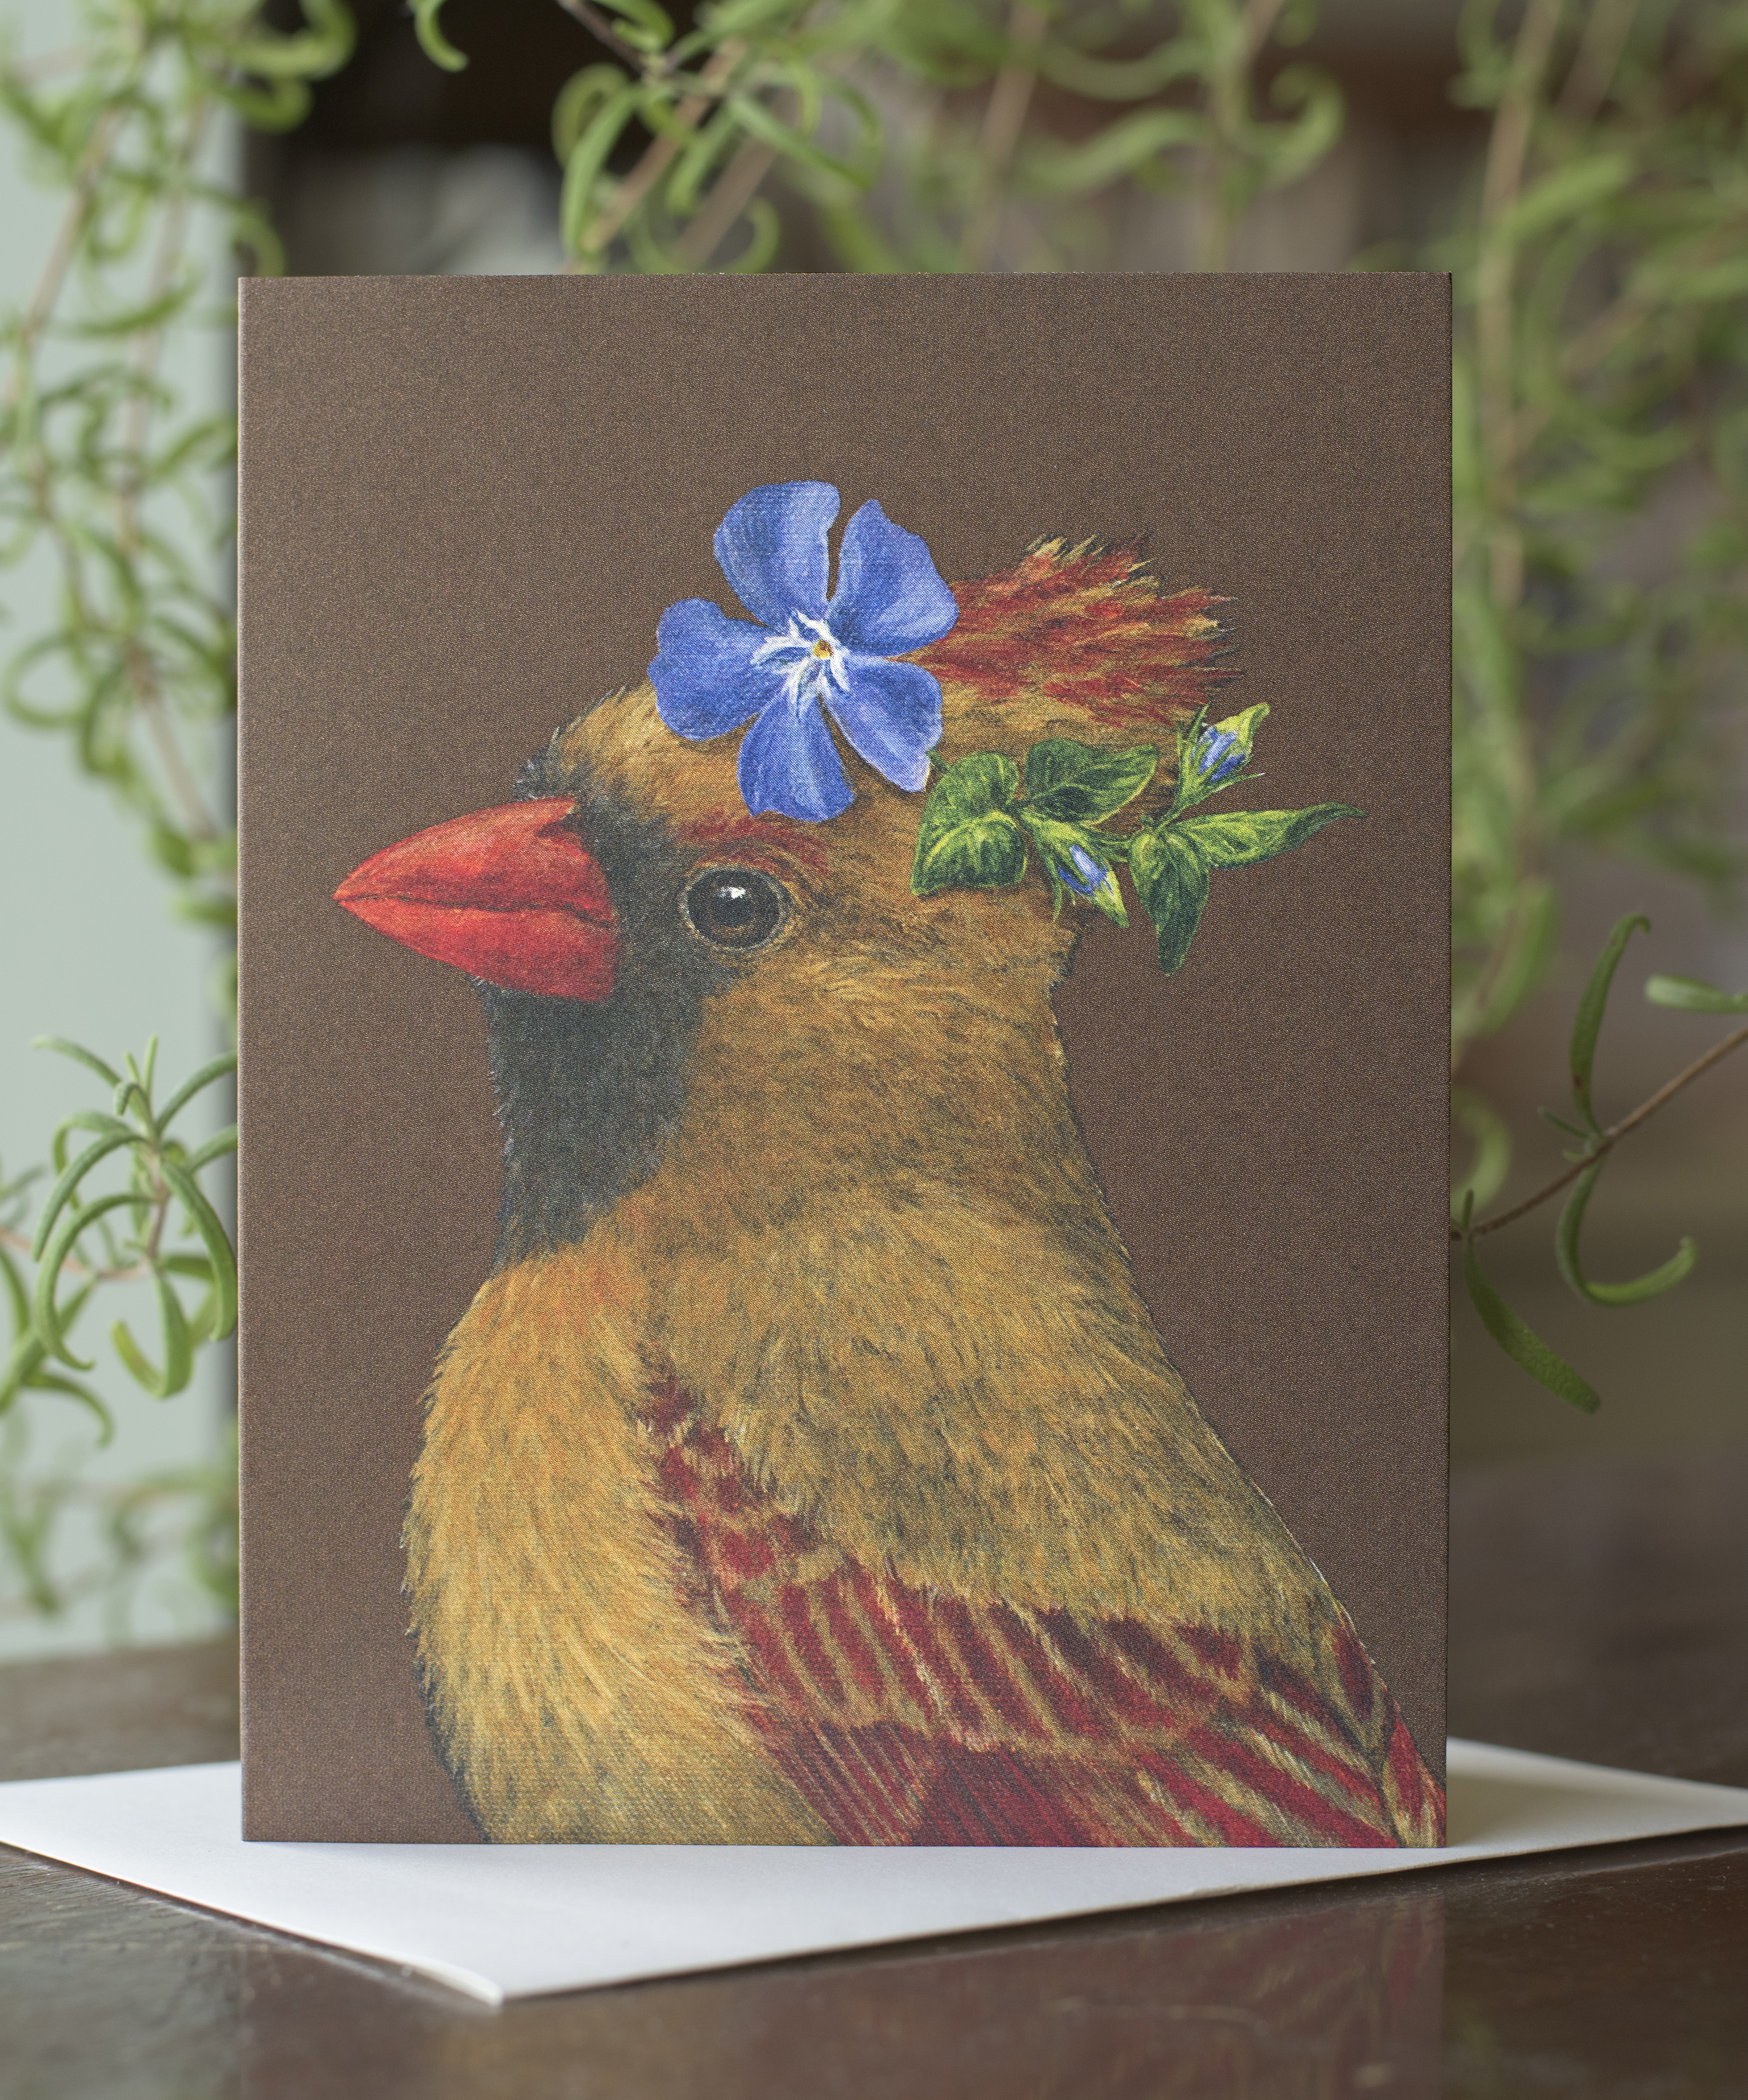 Party Birds Chocolate Card Box Set